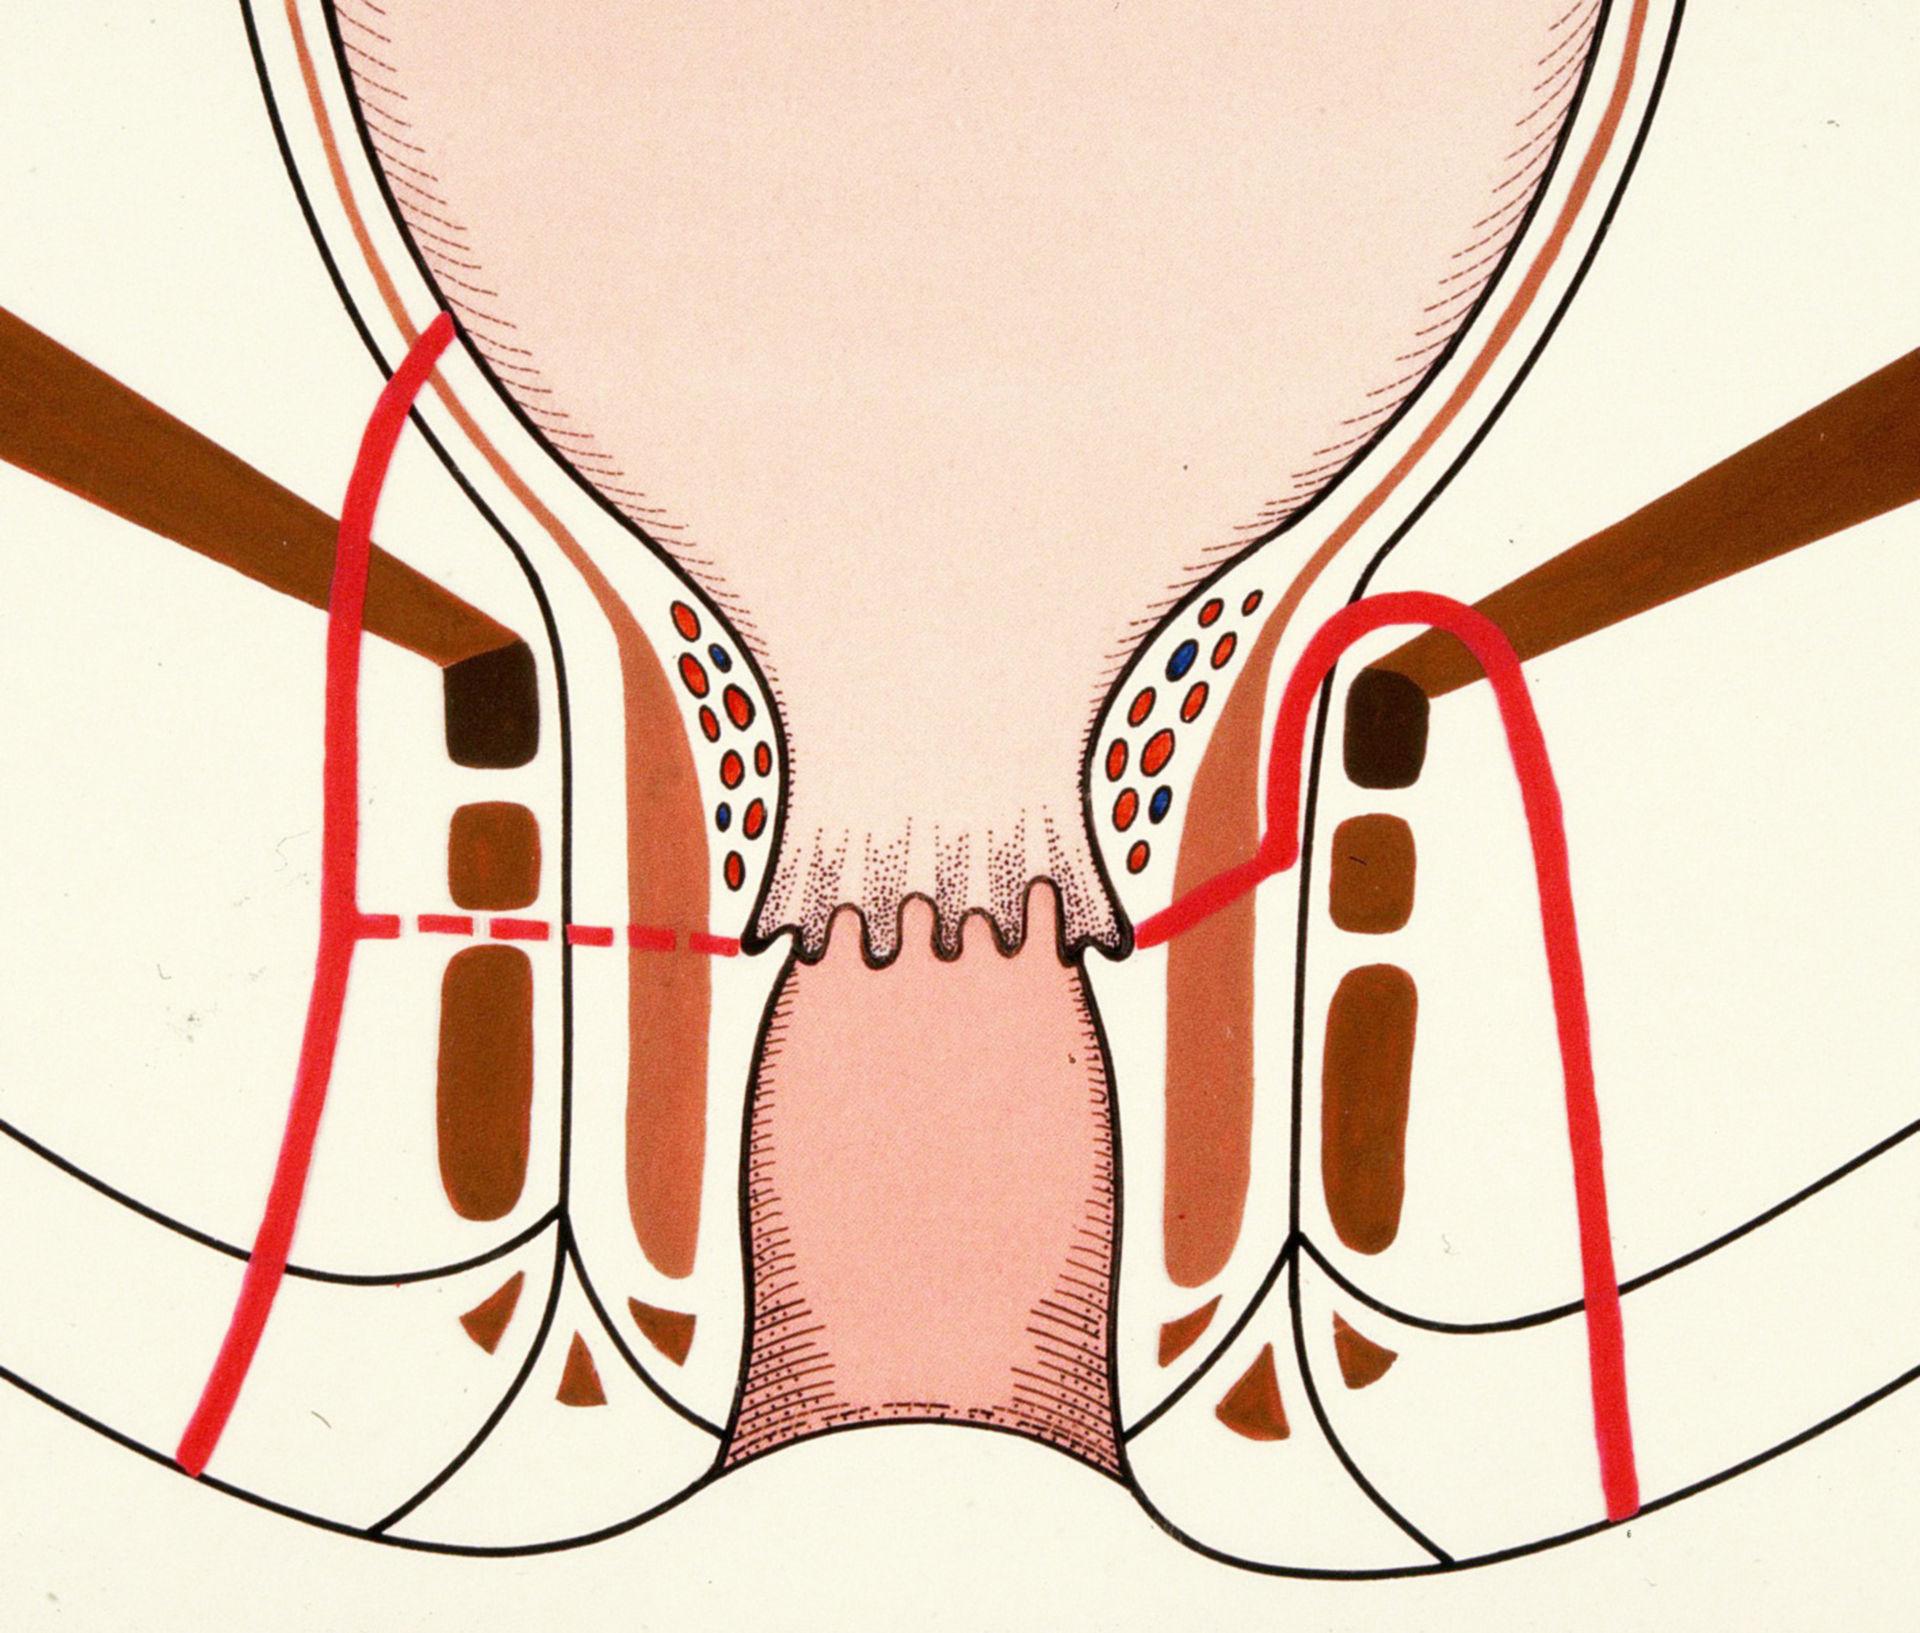 Fístula extraesfinteriana (dibujo esquemático)